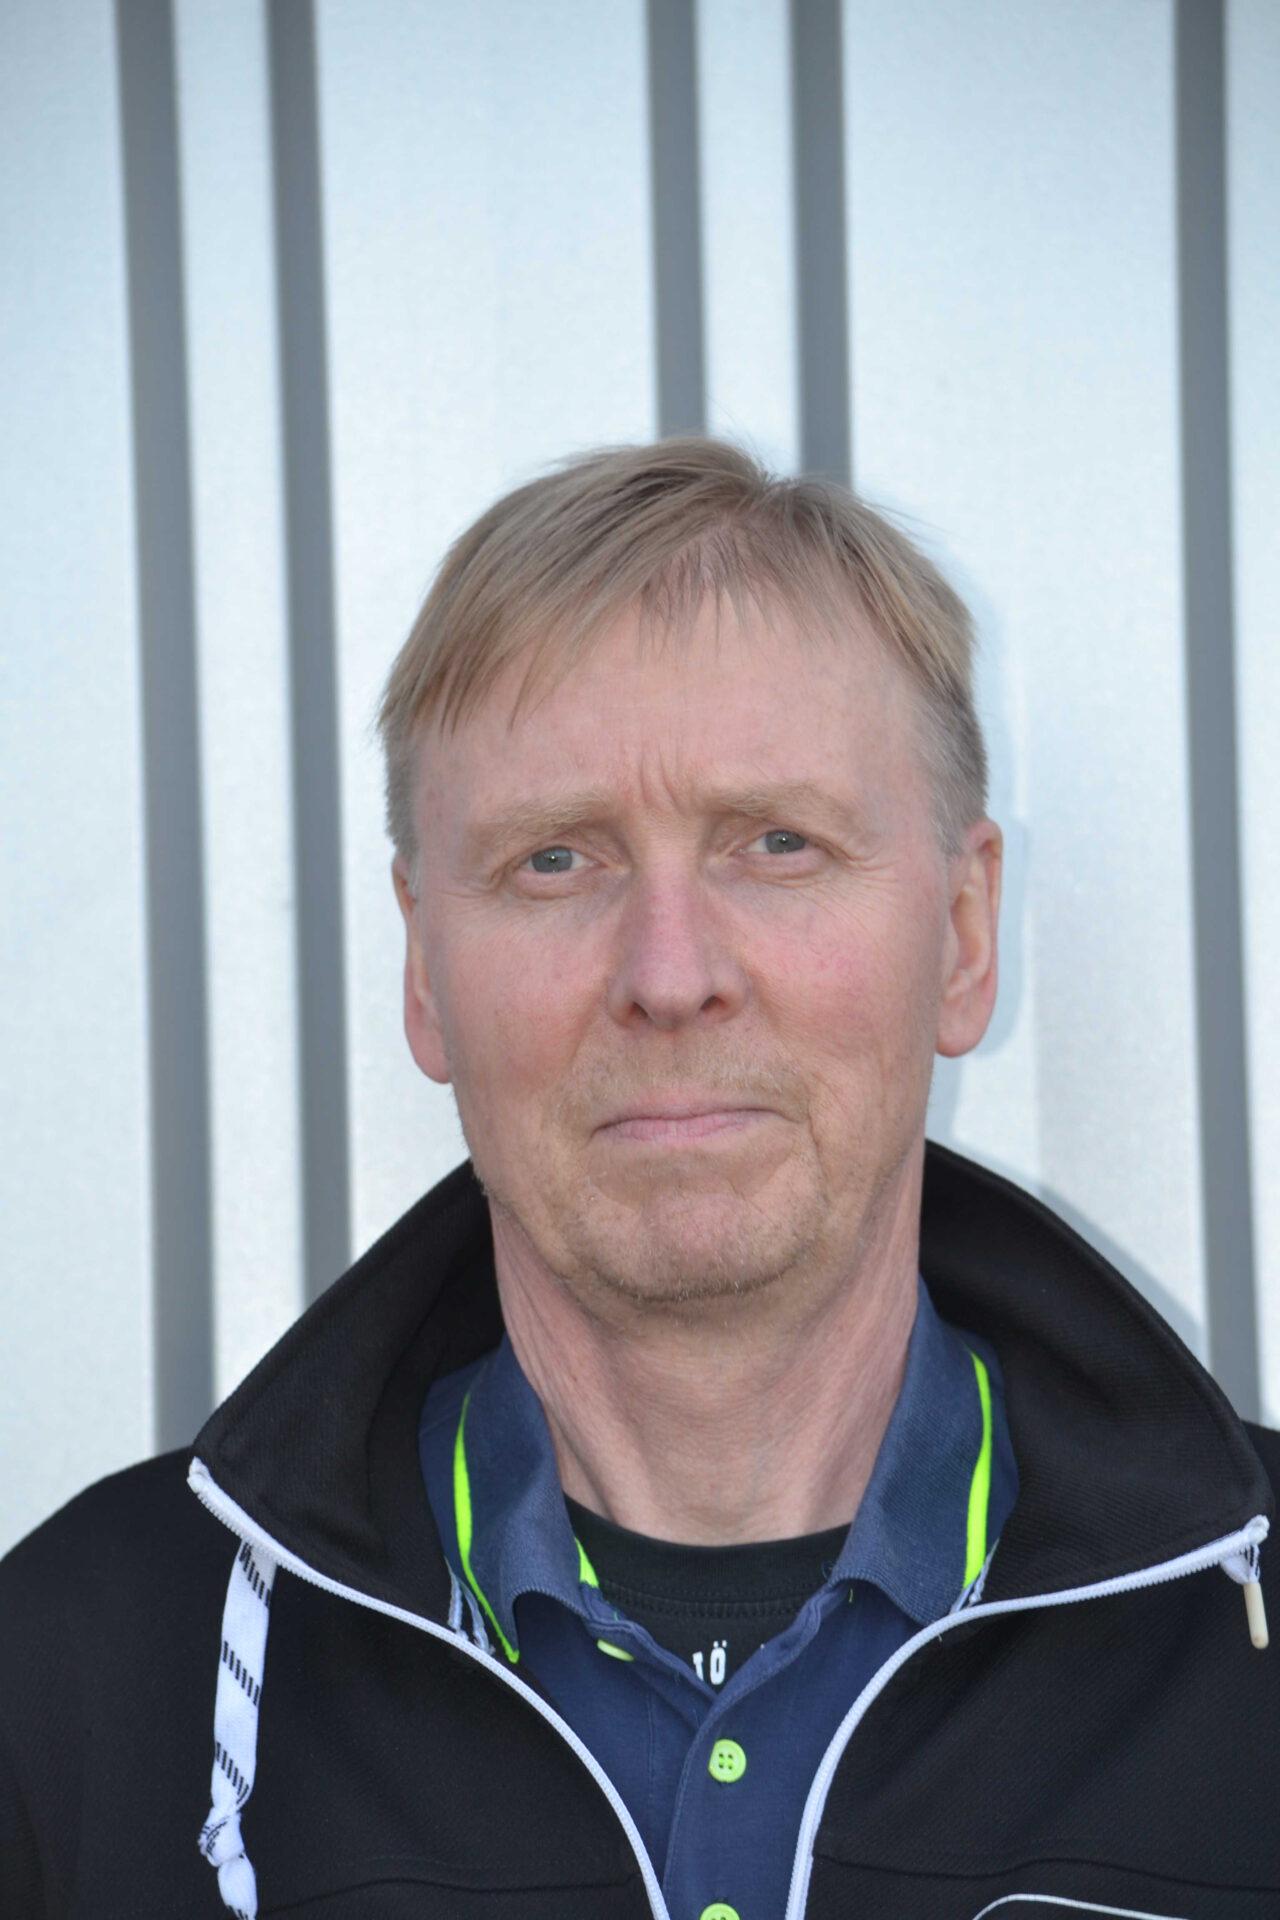 Hans Nordqvist